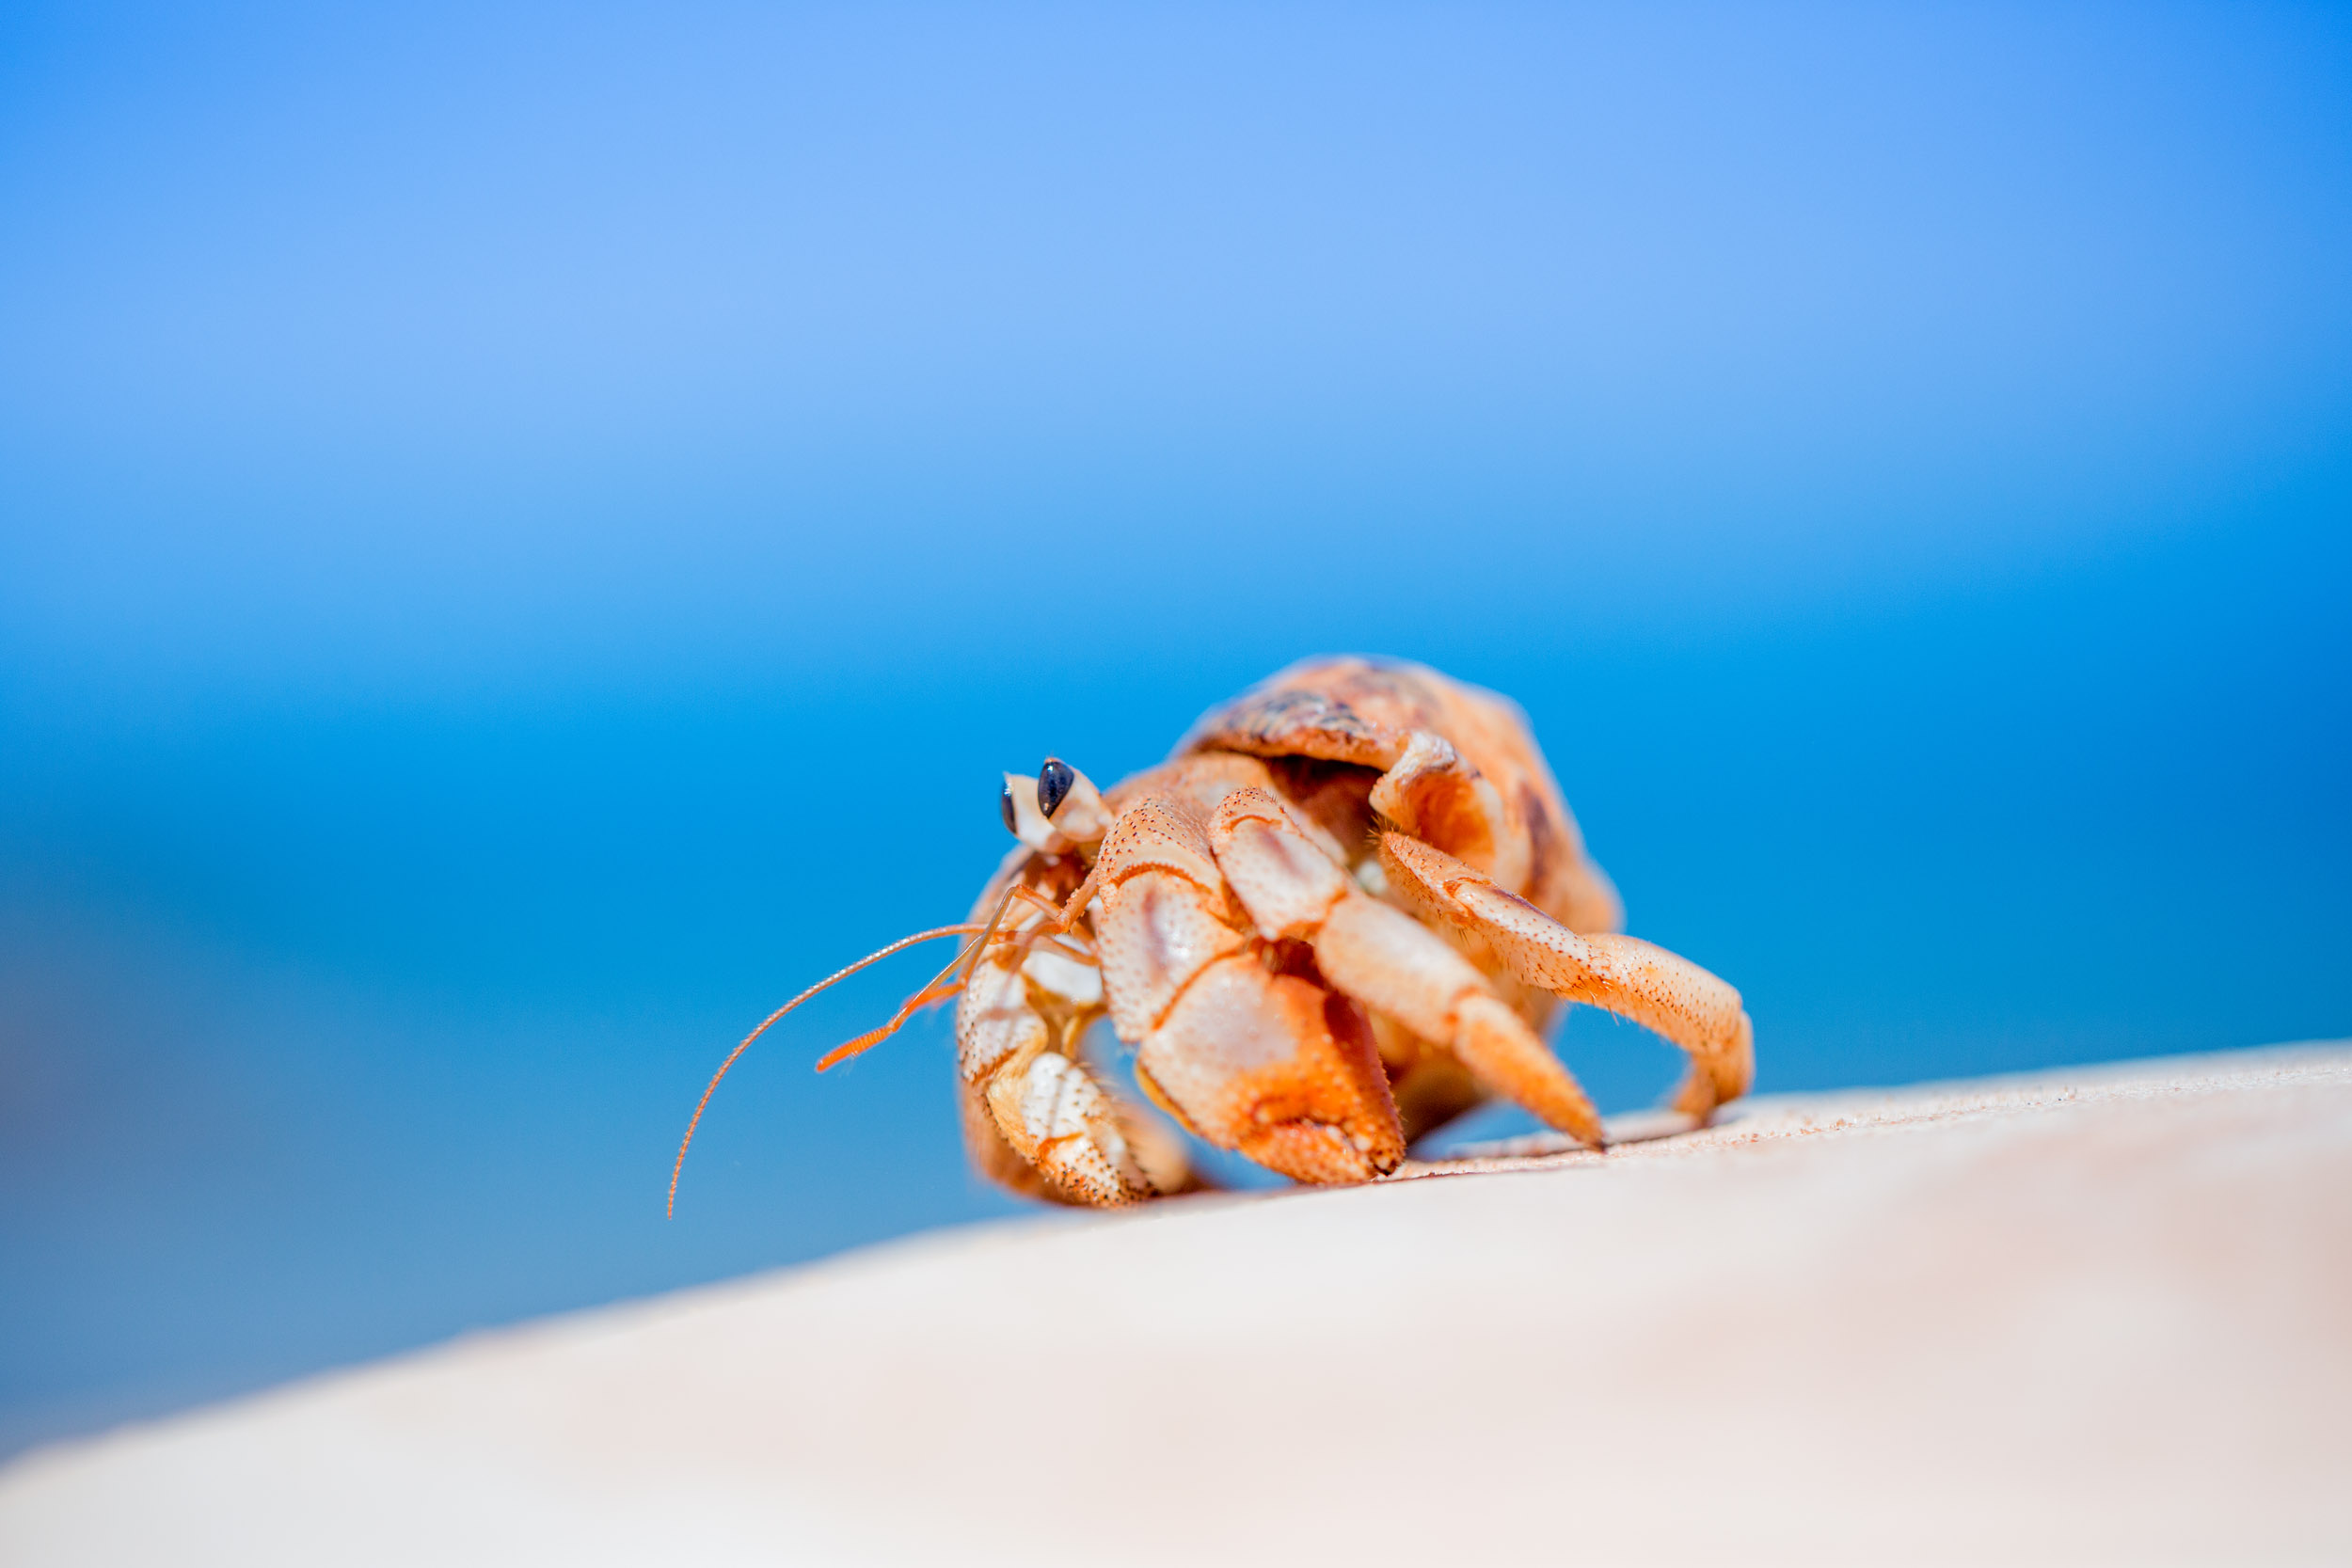 hermit-crab-broome-western-australia.jpg